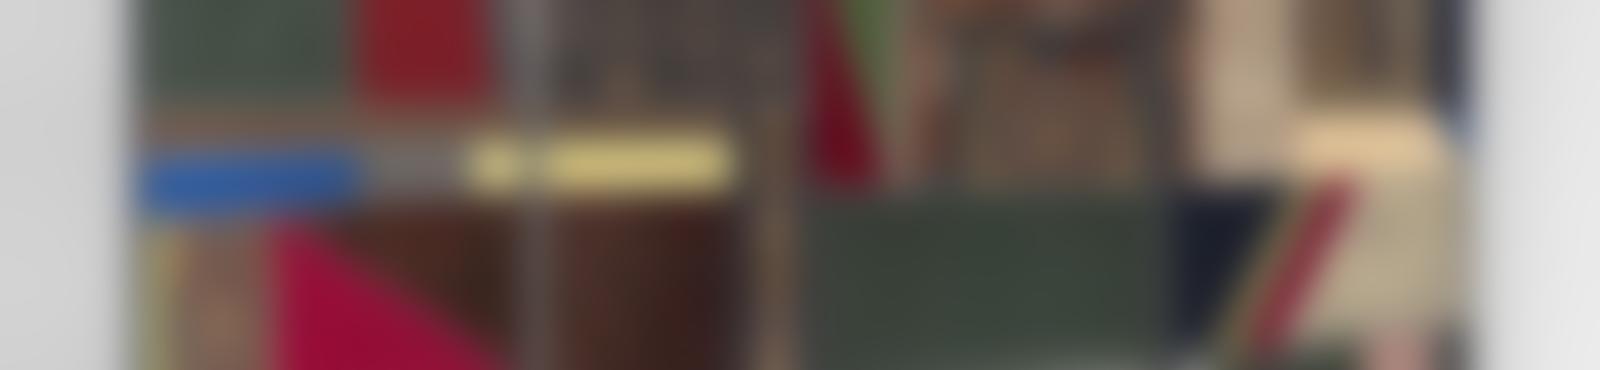 Blurred 79e4e3d3 0e52 4b84 b437 8b9827bb9ff9